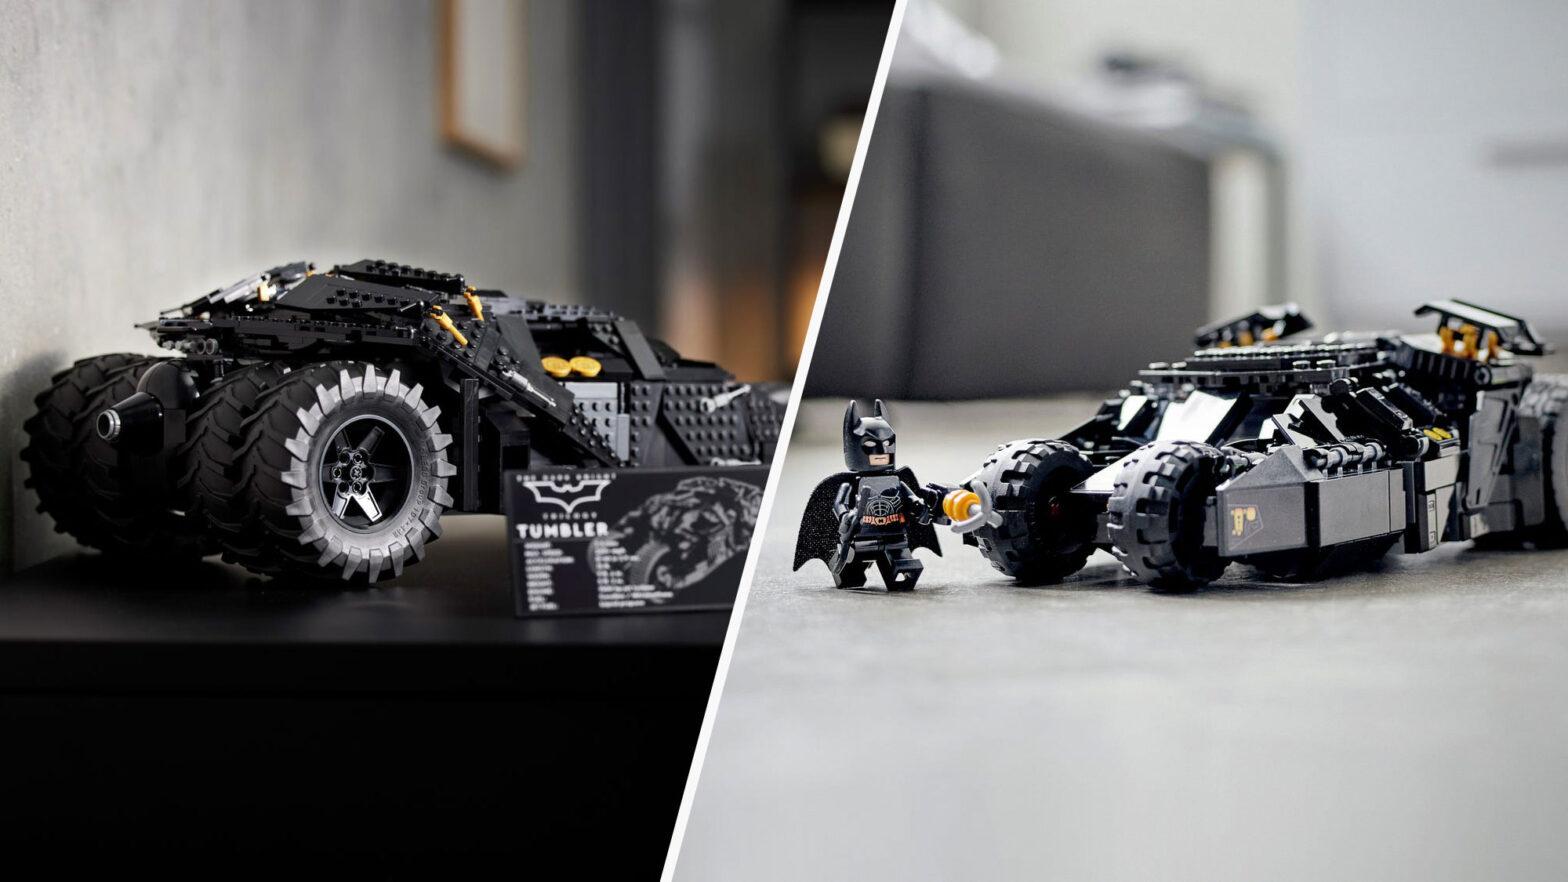 LEGO 76240 and 76239 Batmobile Tumbler Sets